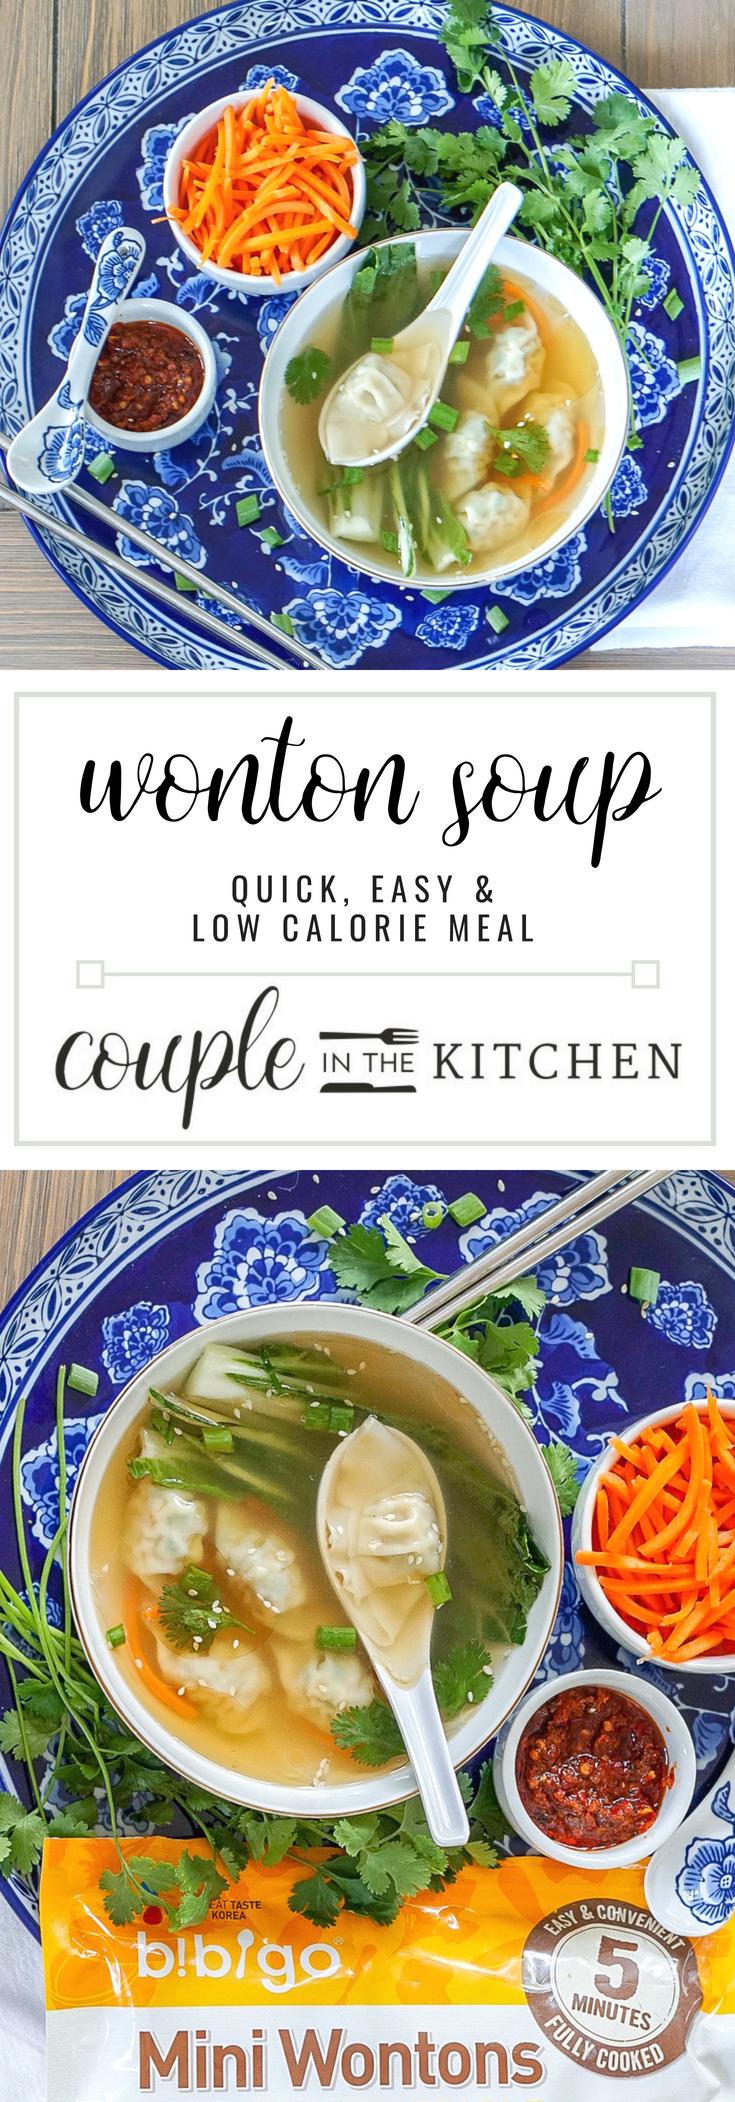 Easy, Wonton Soup Recipe | coupleinthekitchen.com